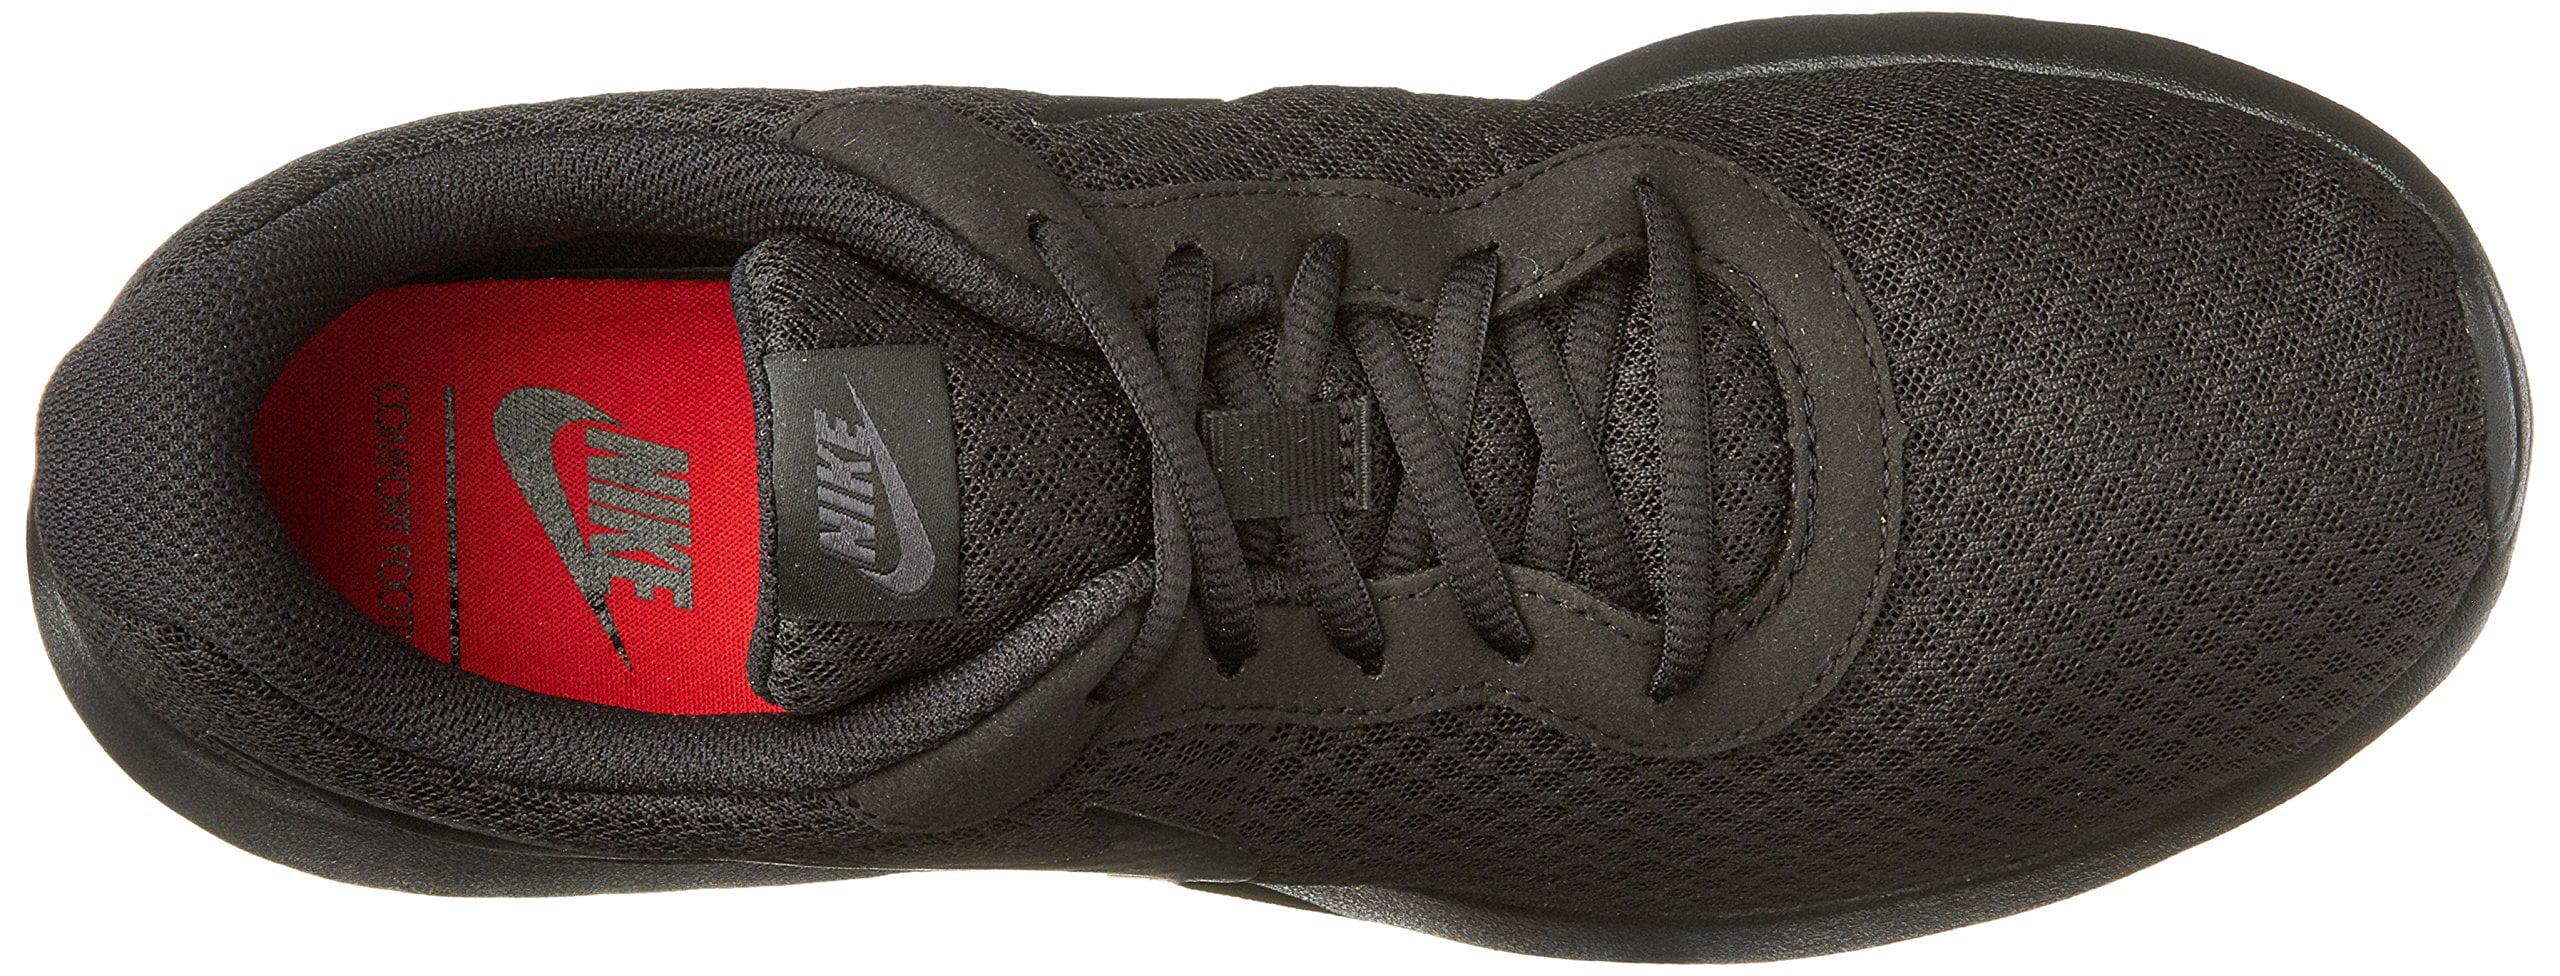 Nike Mens Tanjun Running Sneaker Black/Anthracite/Black, US Men's